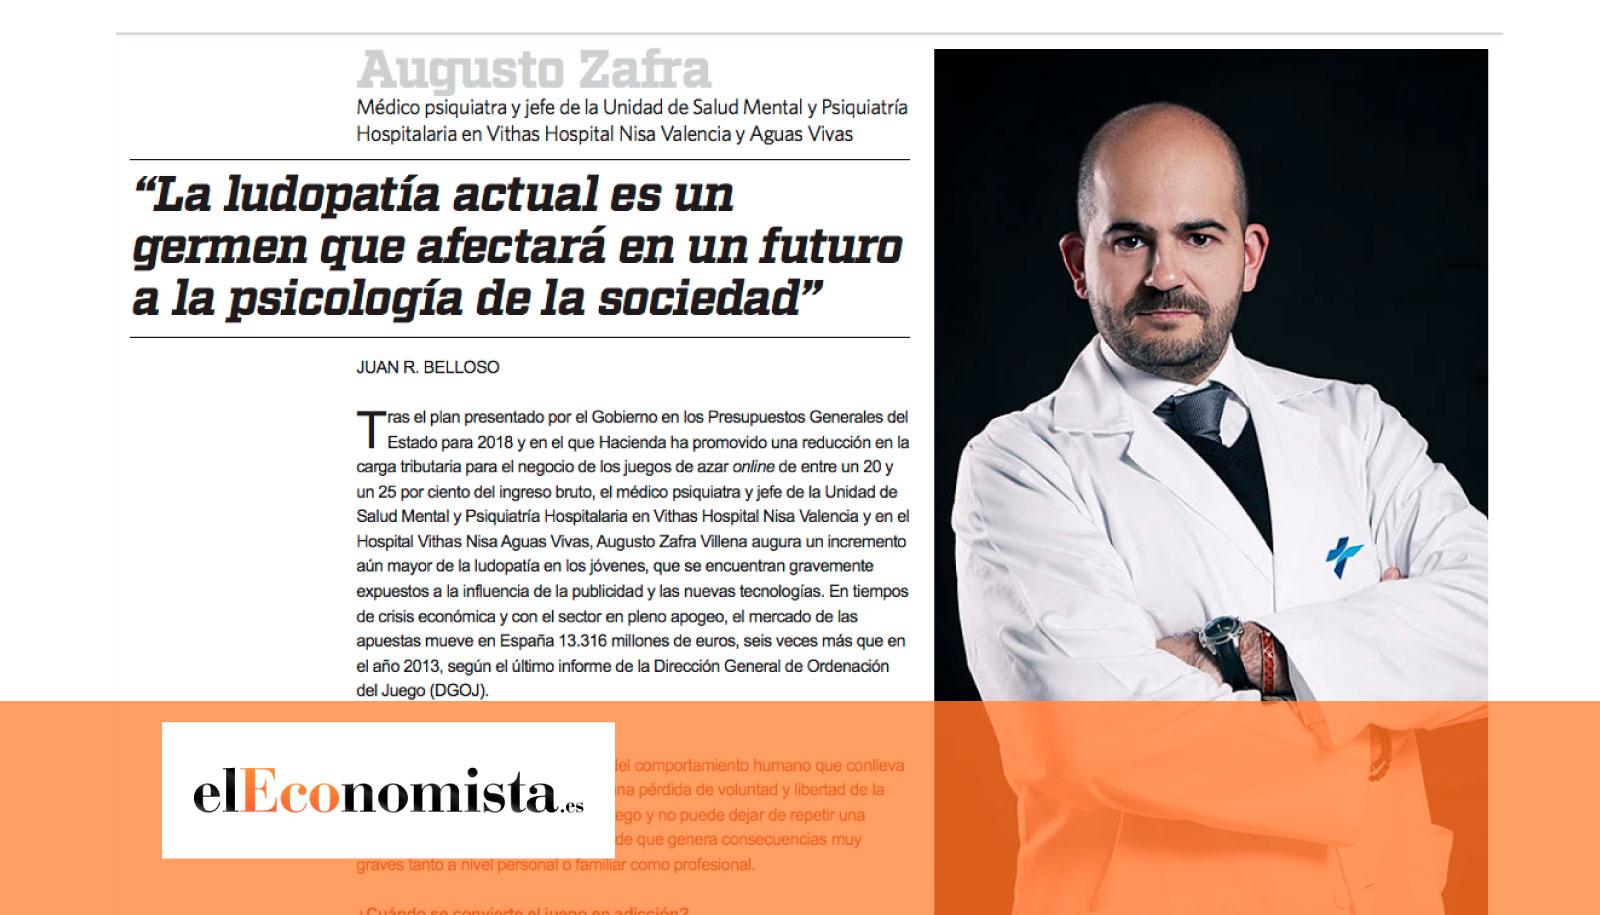 Entrevista elEconomista al Dr. Augusto Zafra sobre la ludopatía